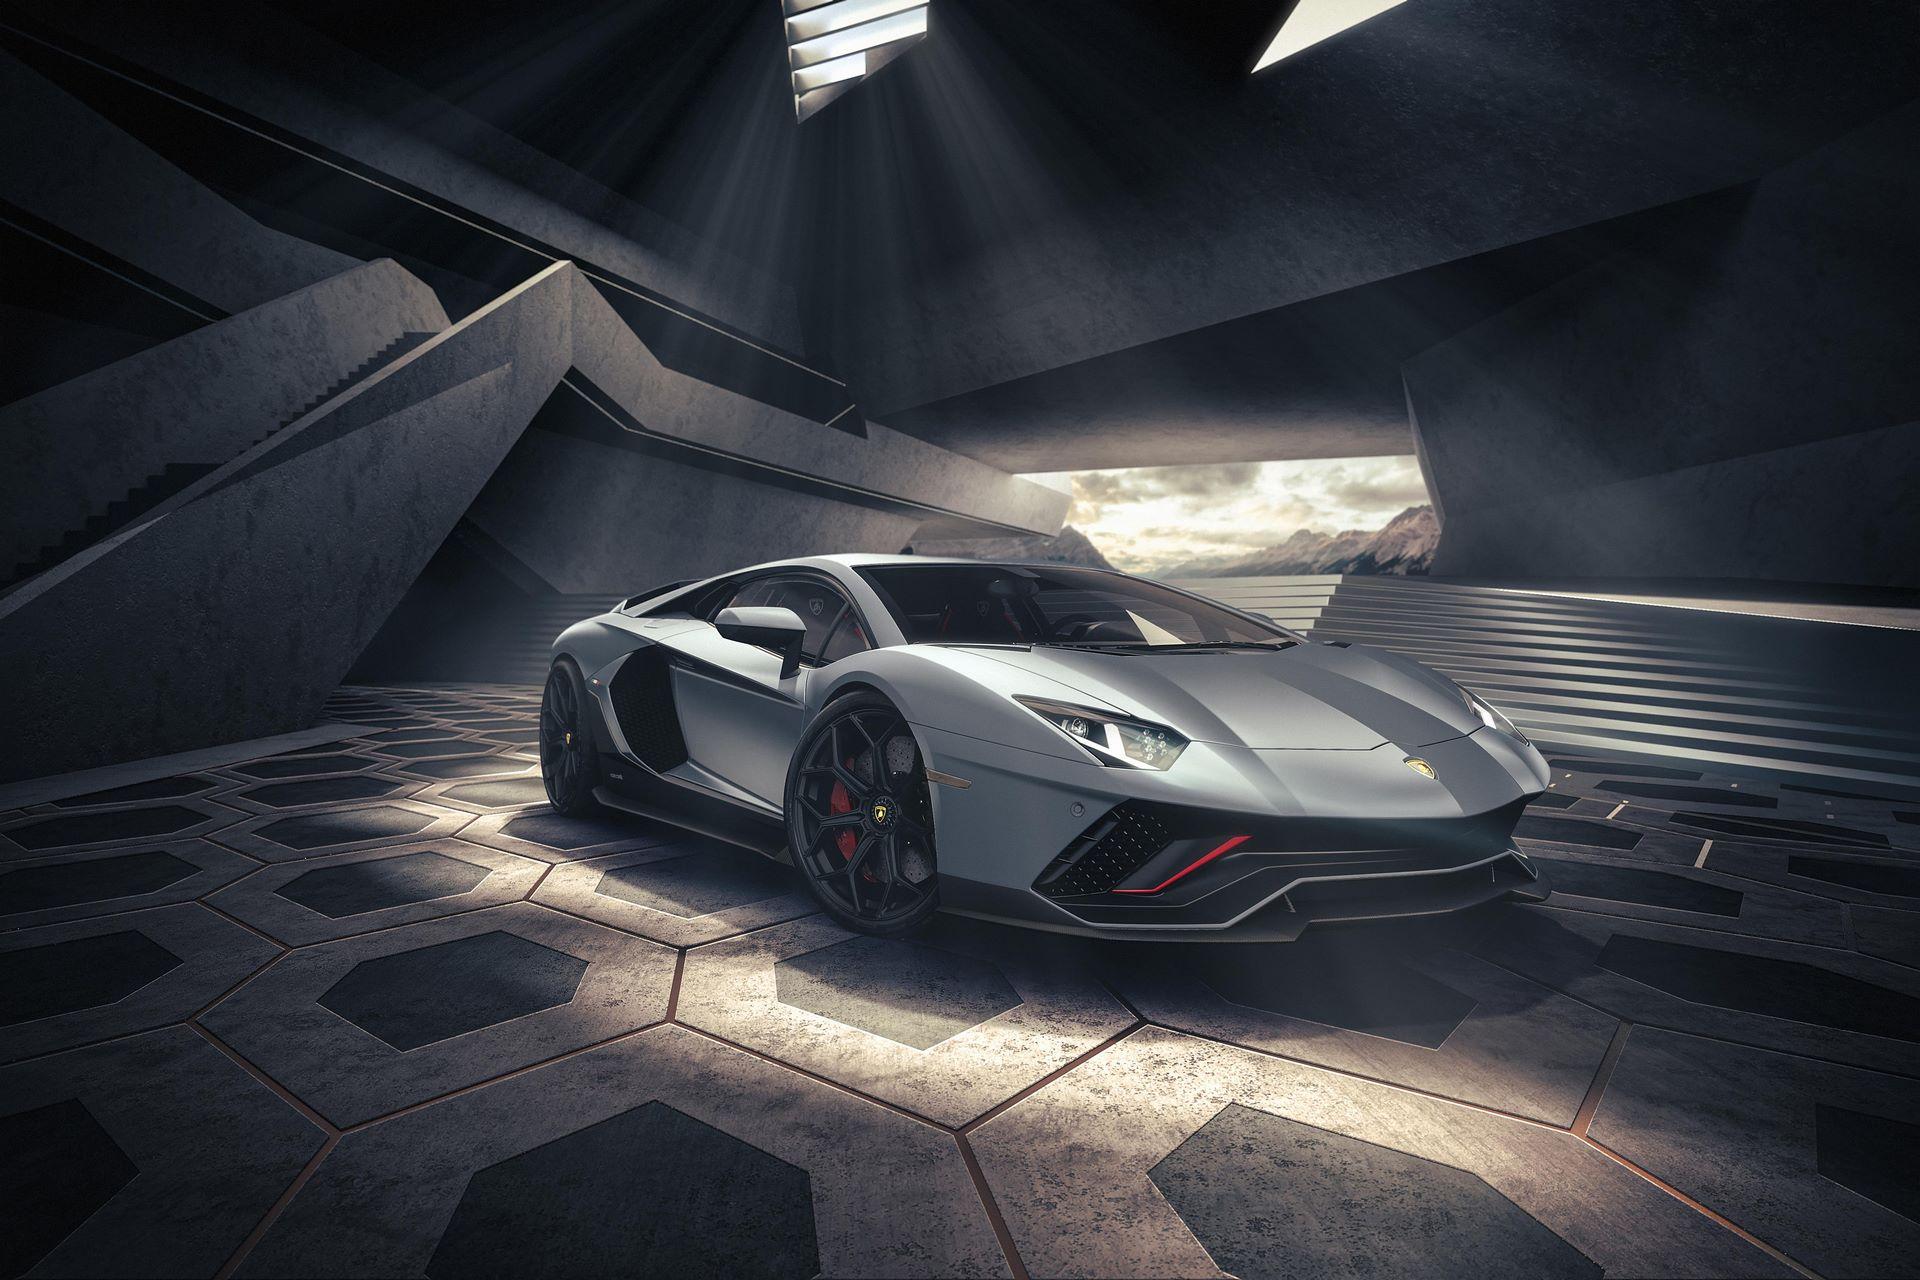 Lamborghini-Aventador-LP780-4-Ultimae-13